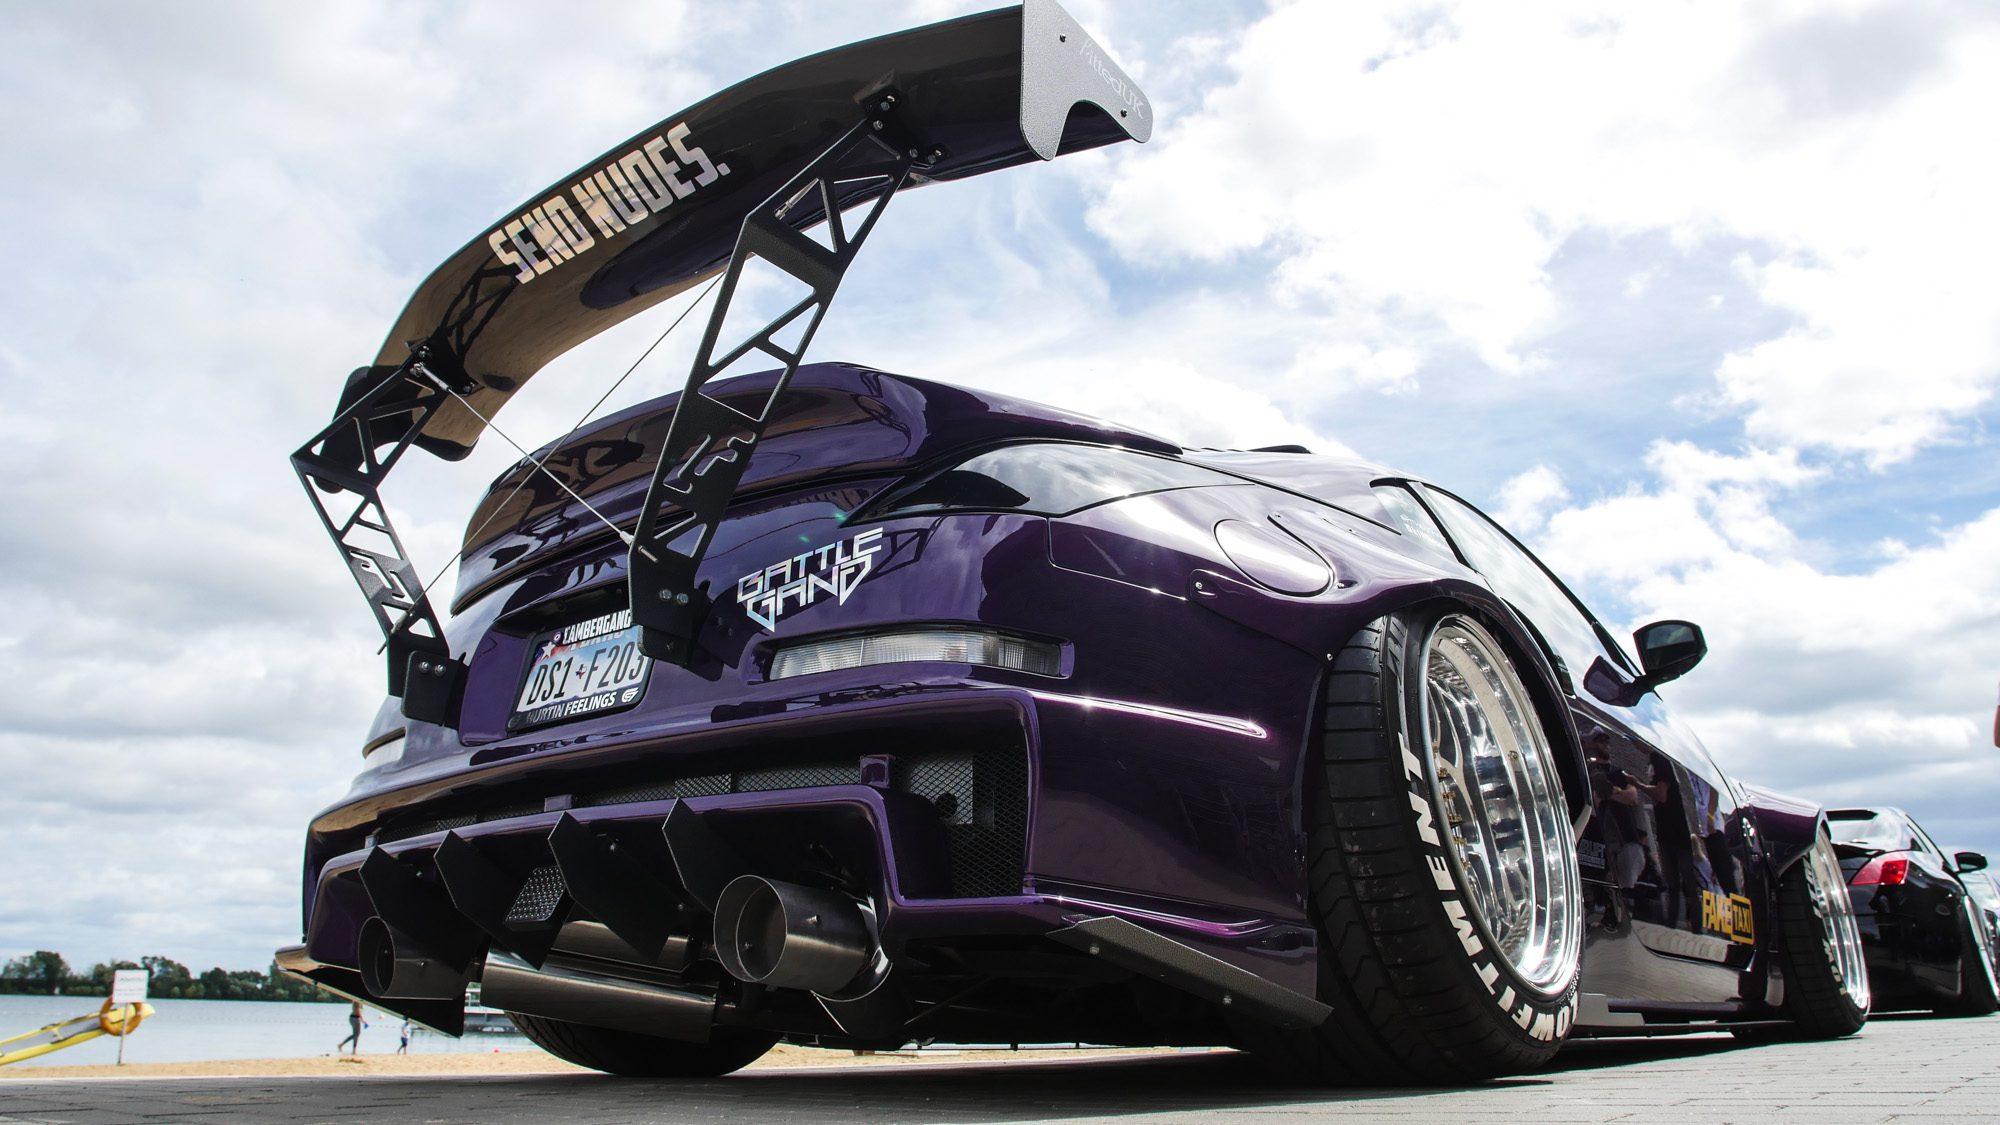 Gewaltiger Flügel am Heck des Nissan 350Z